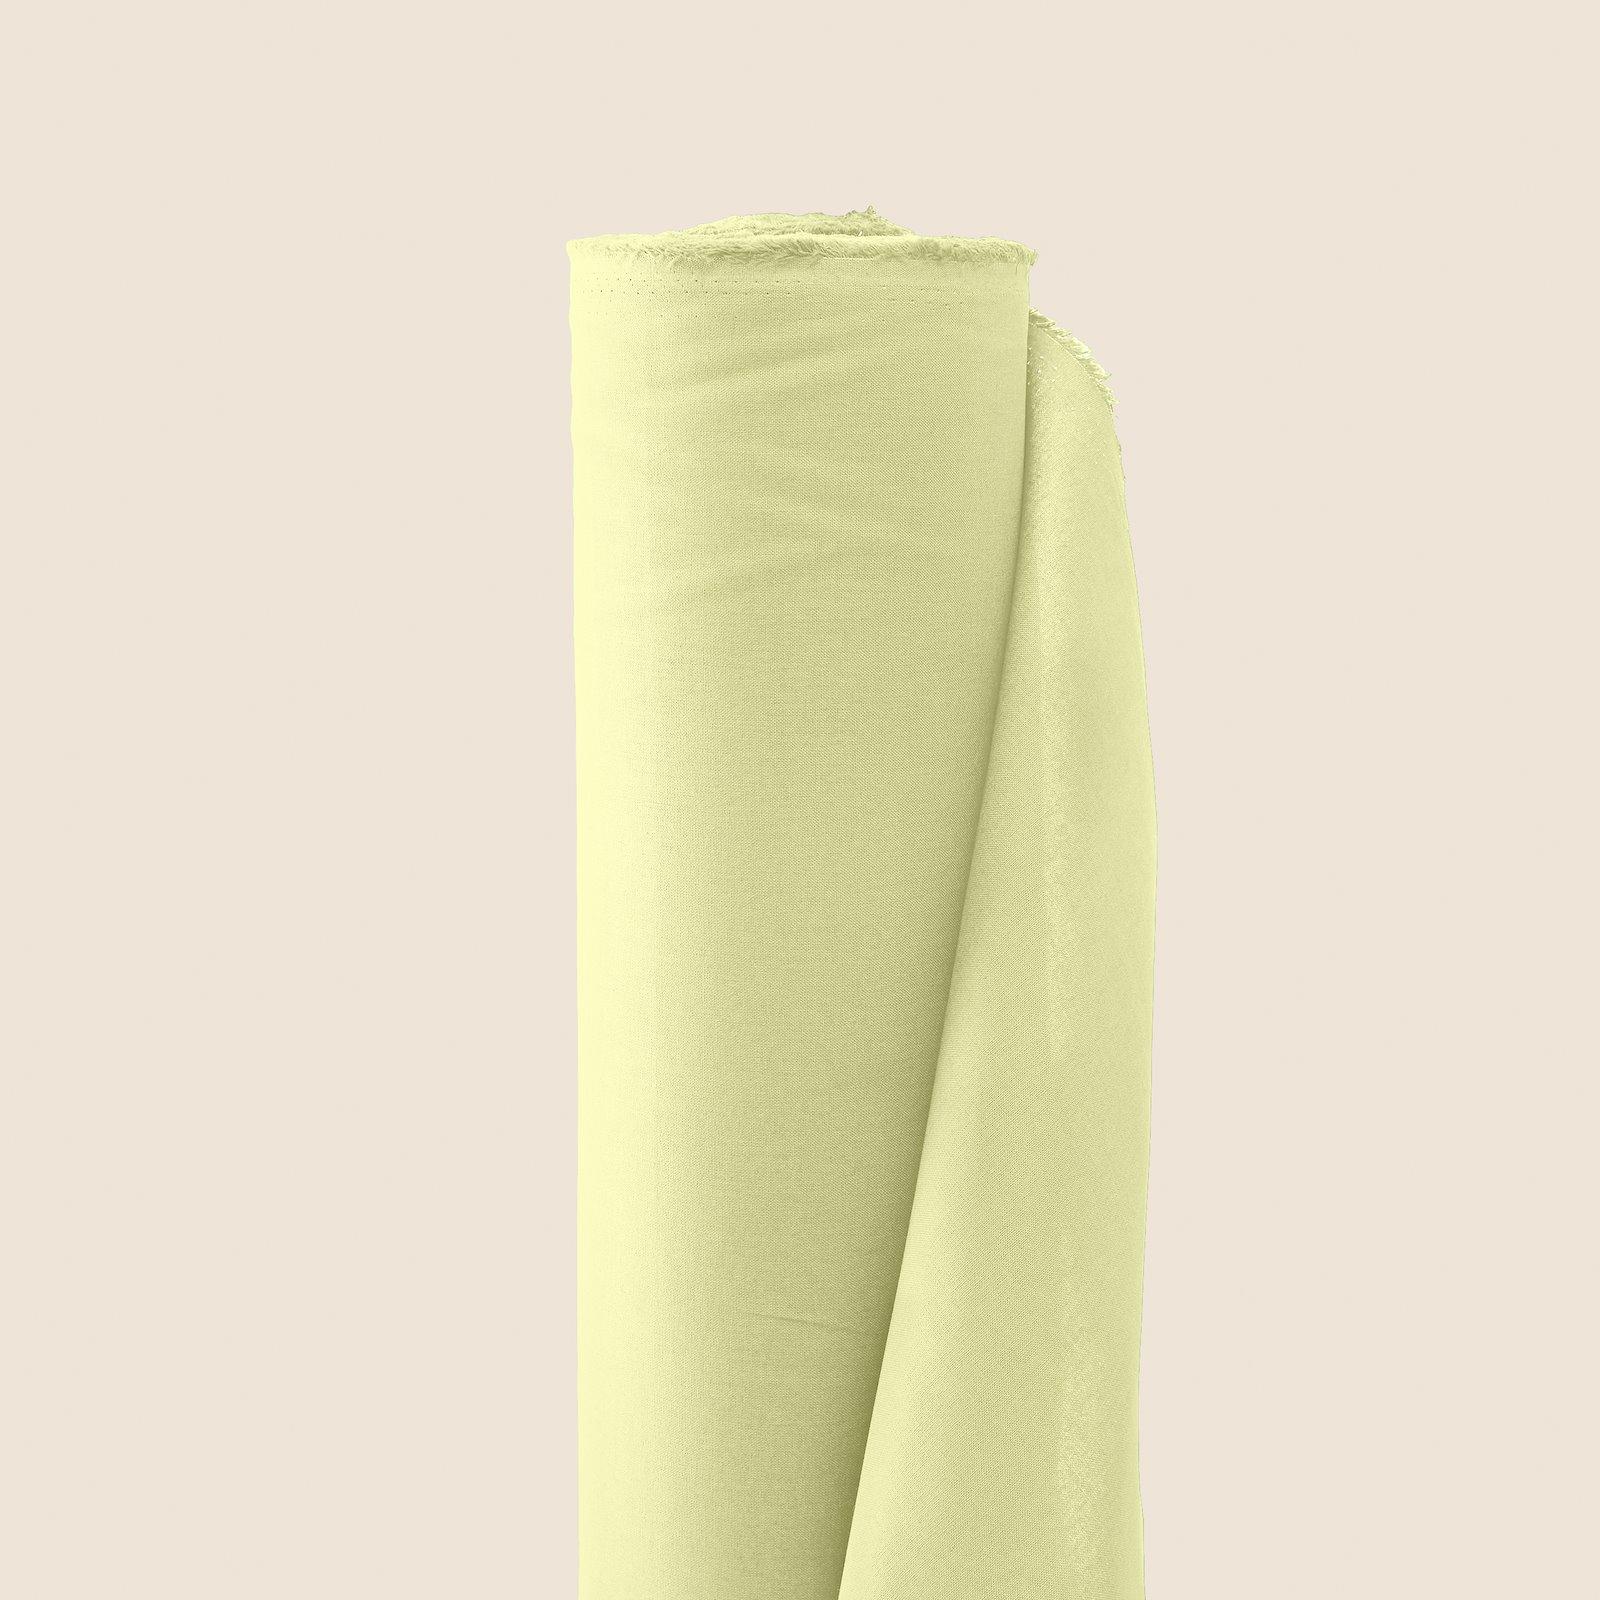 Luxury cotton light lemon 4357_pack_d